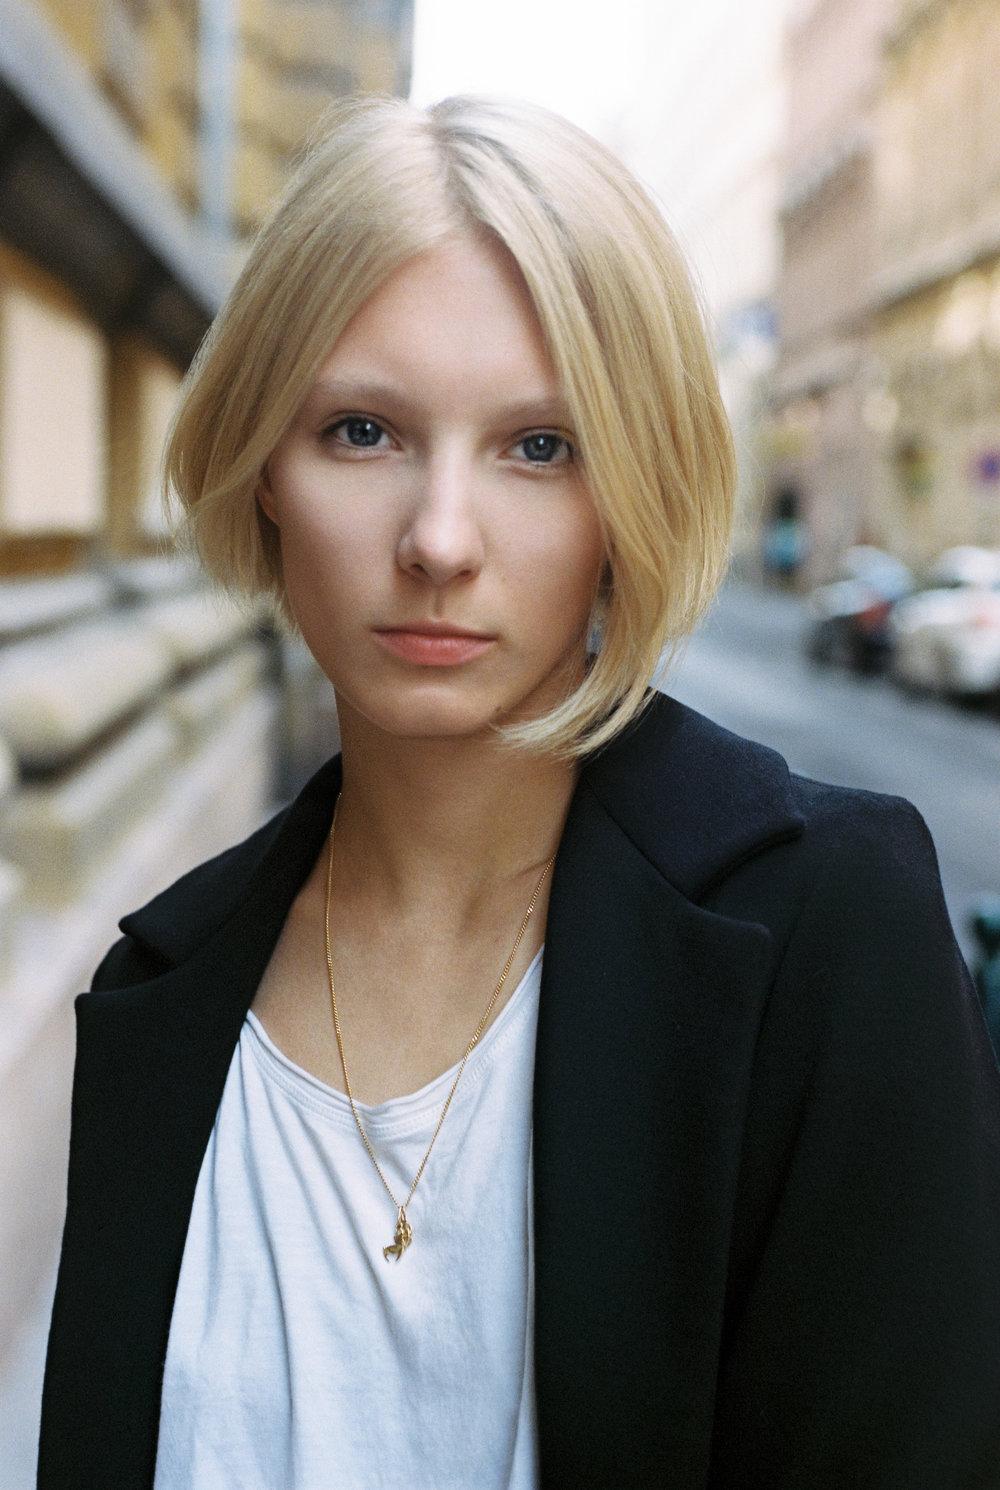 Bogilárka-Sáfrán-by-Jacqueline-Puwalski-27.jpg